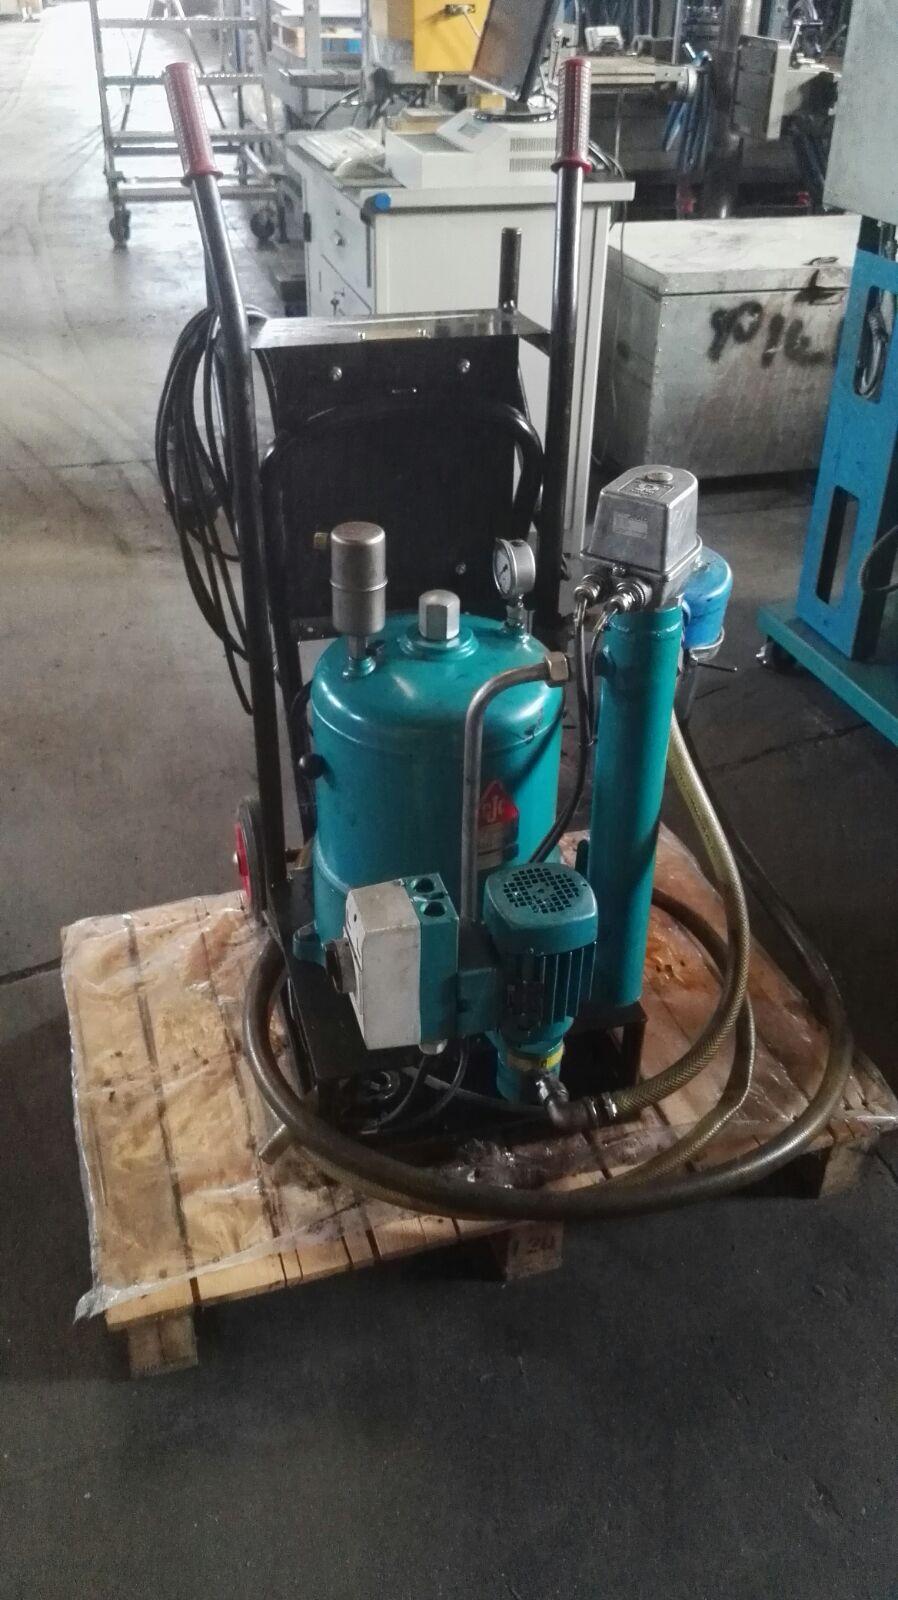 Pompa aspira/filtra olio C.C JENSEN